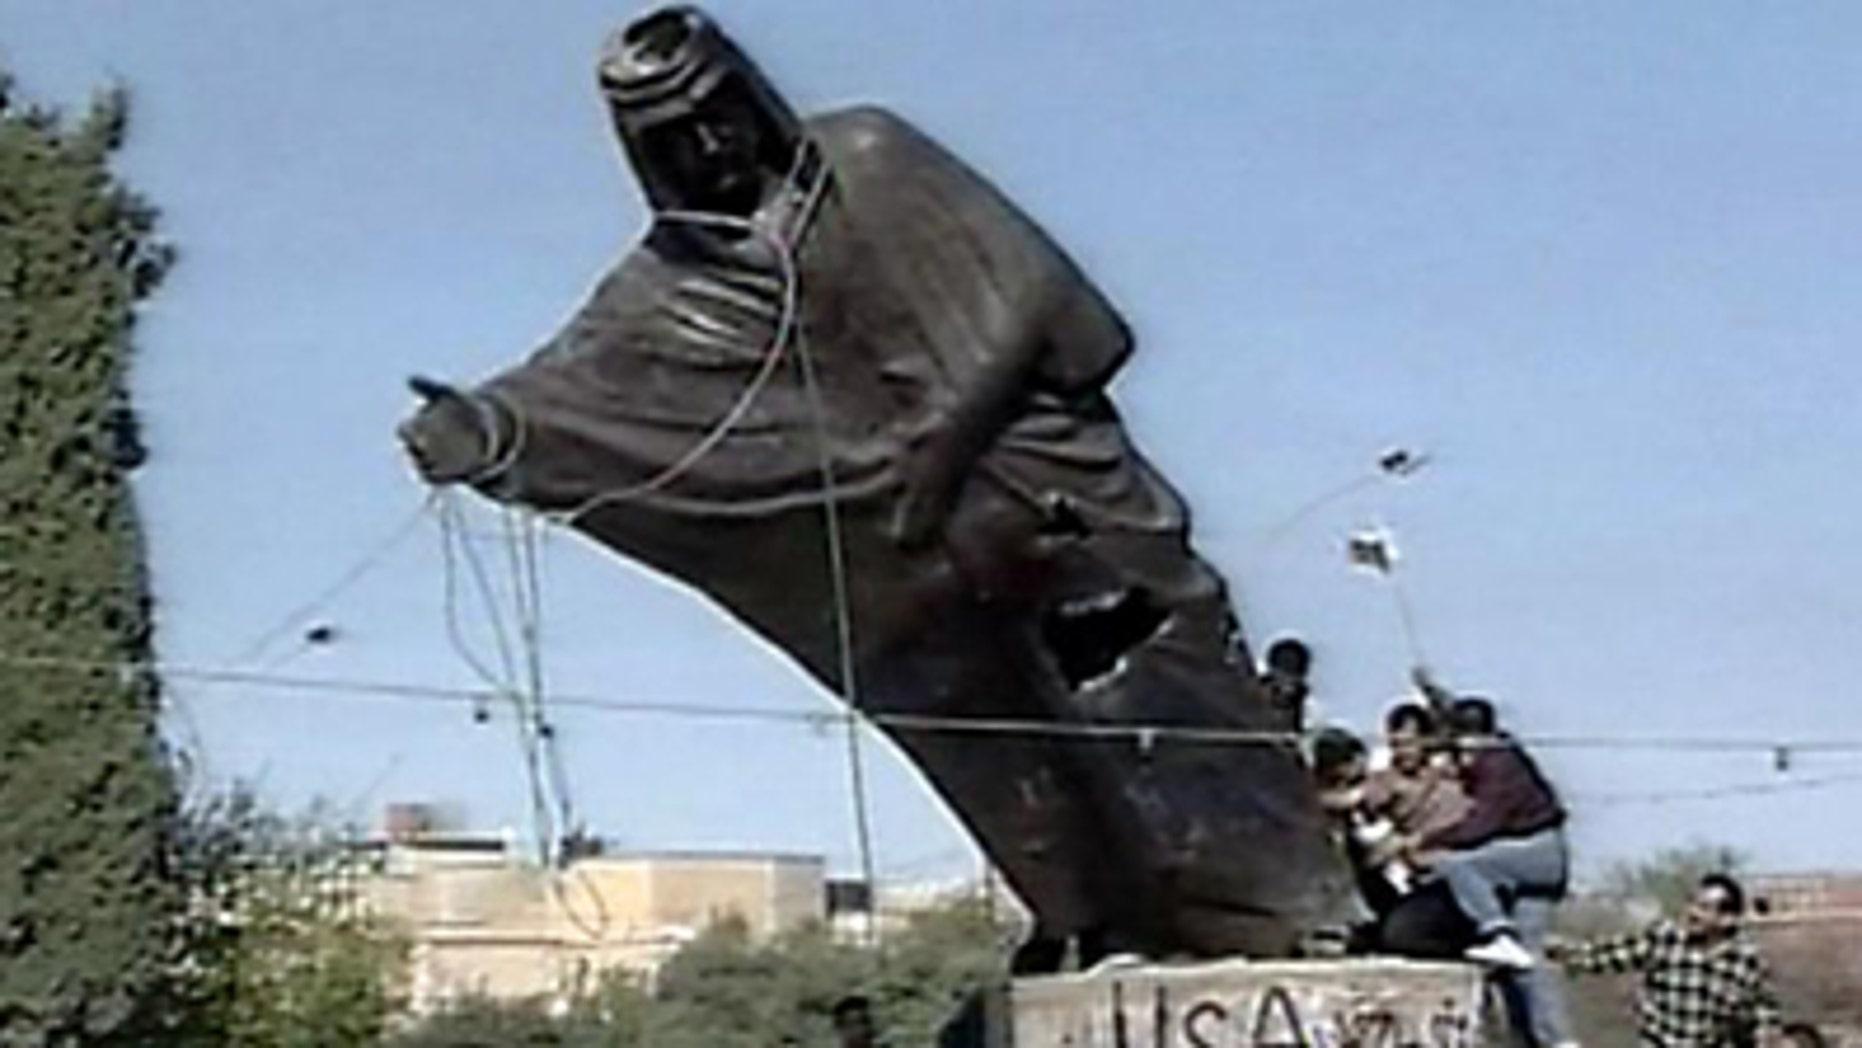 Kurds topple the statue of Saddam Hussein in Kirkuk, Northern Iraq in 2003.